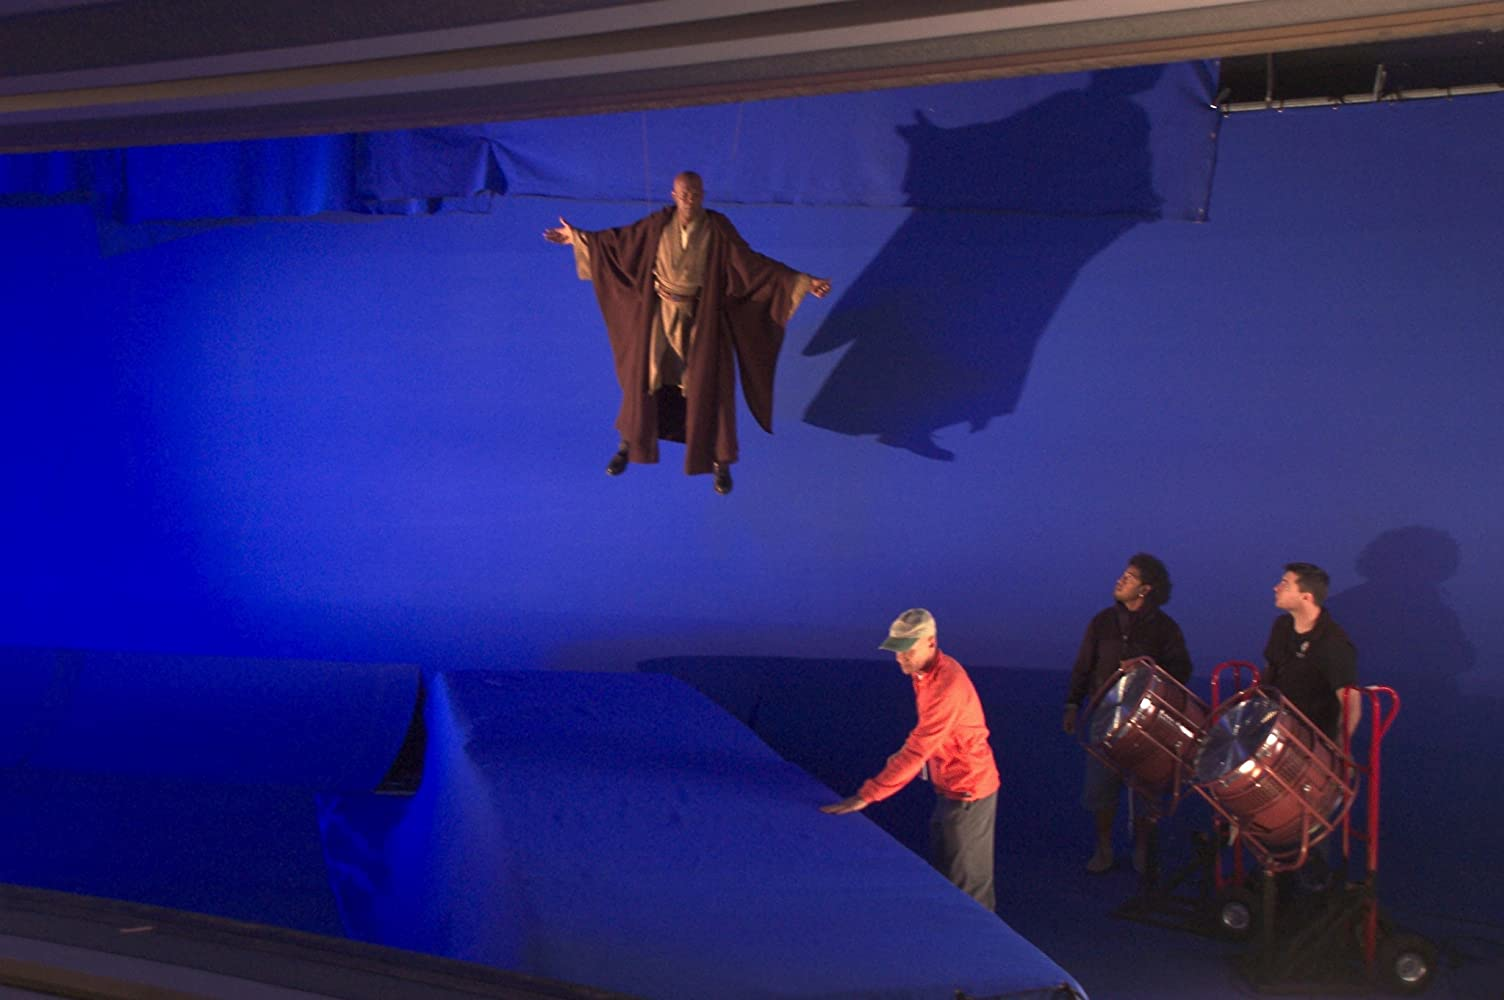 Samuel L. Jackson in Star Wars: Episode III - Revenge of the Sith (2005)